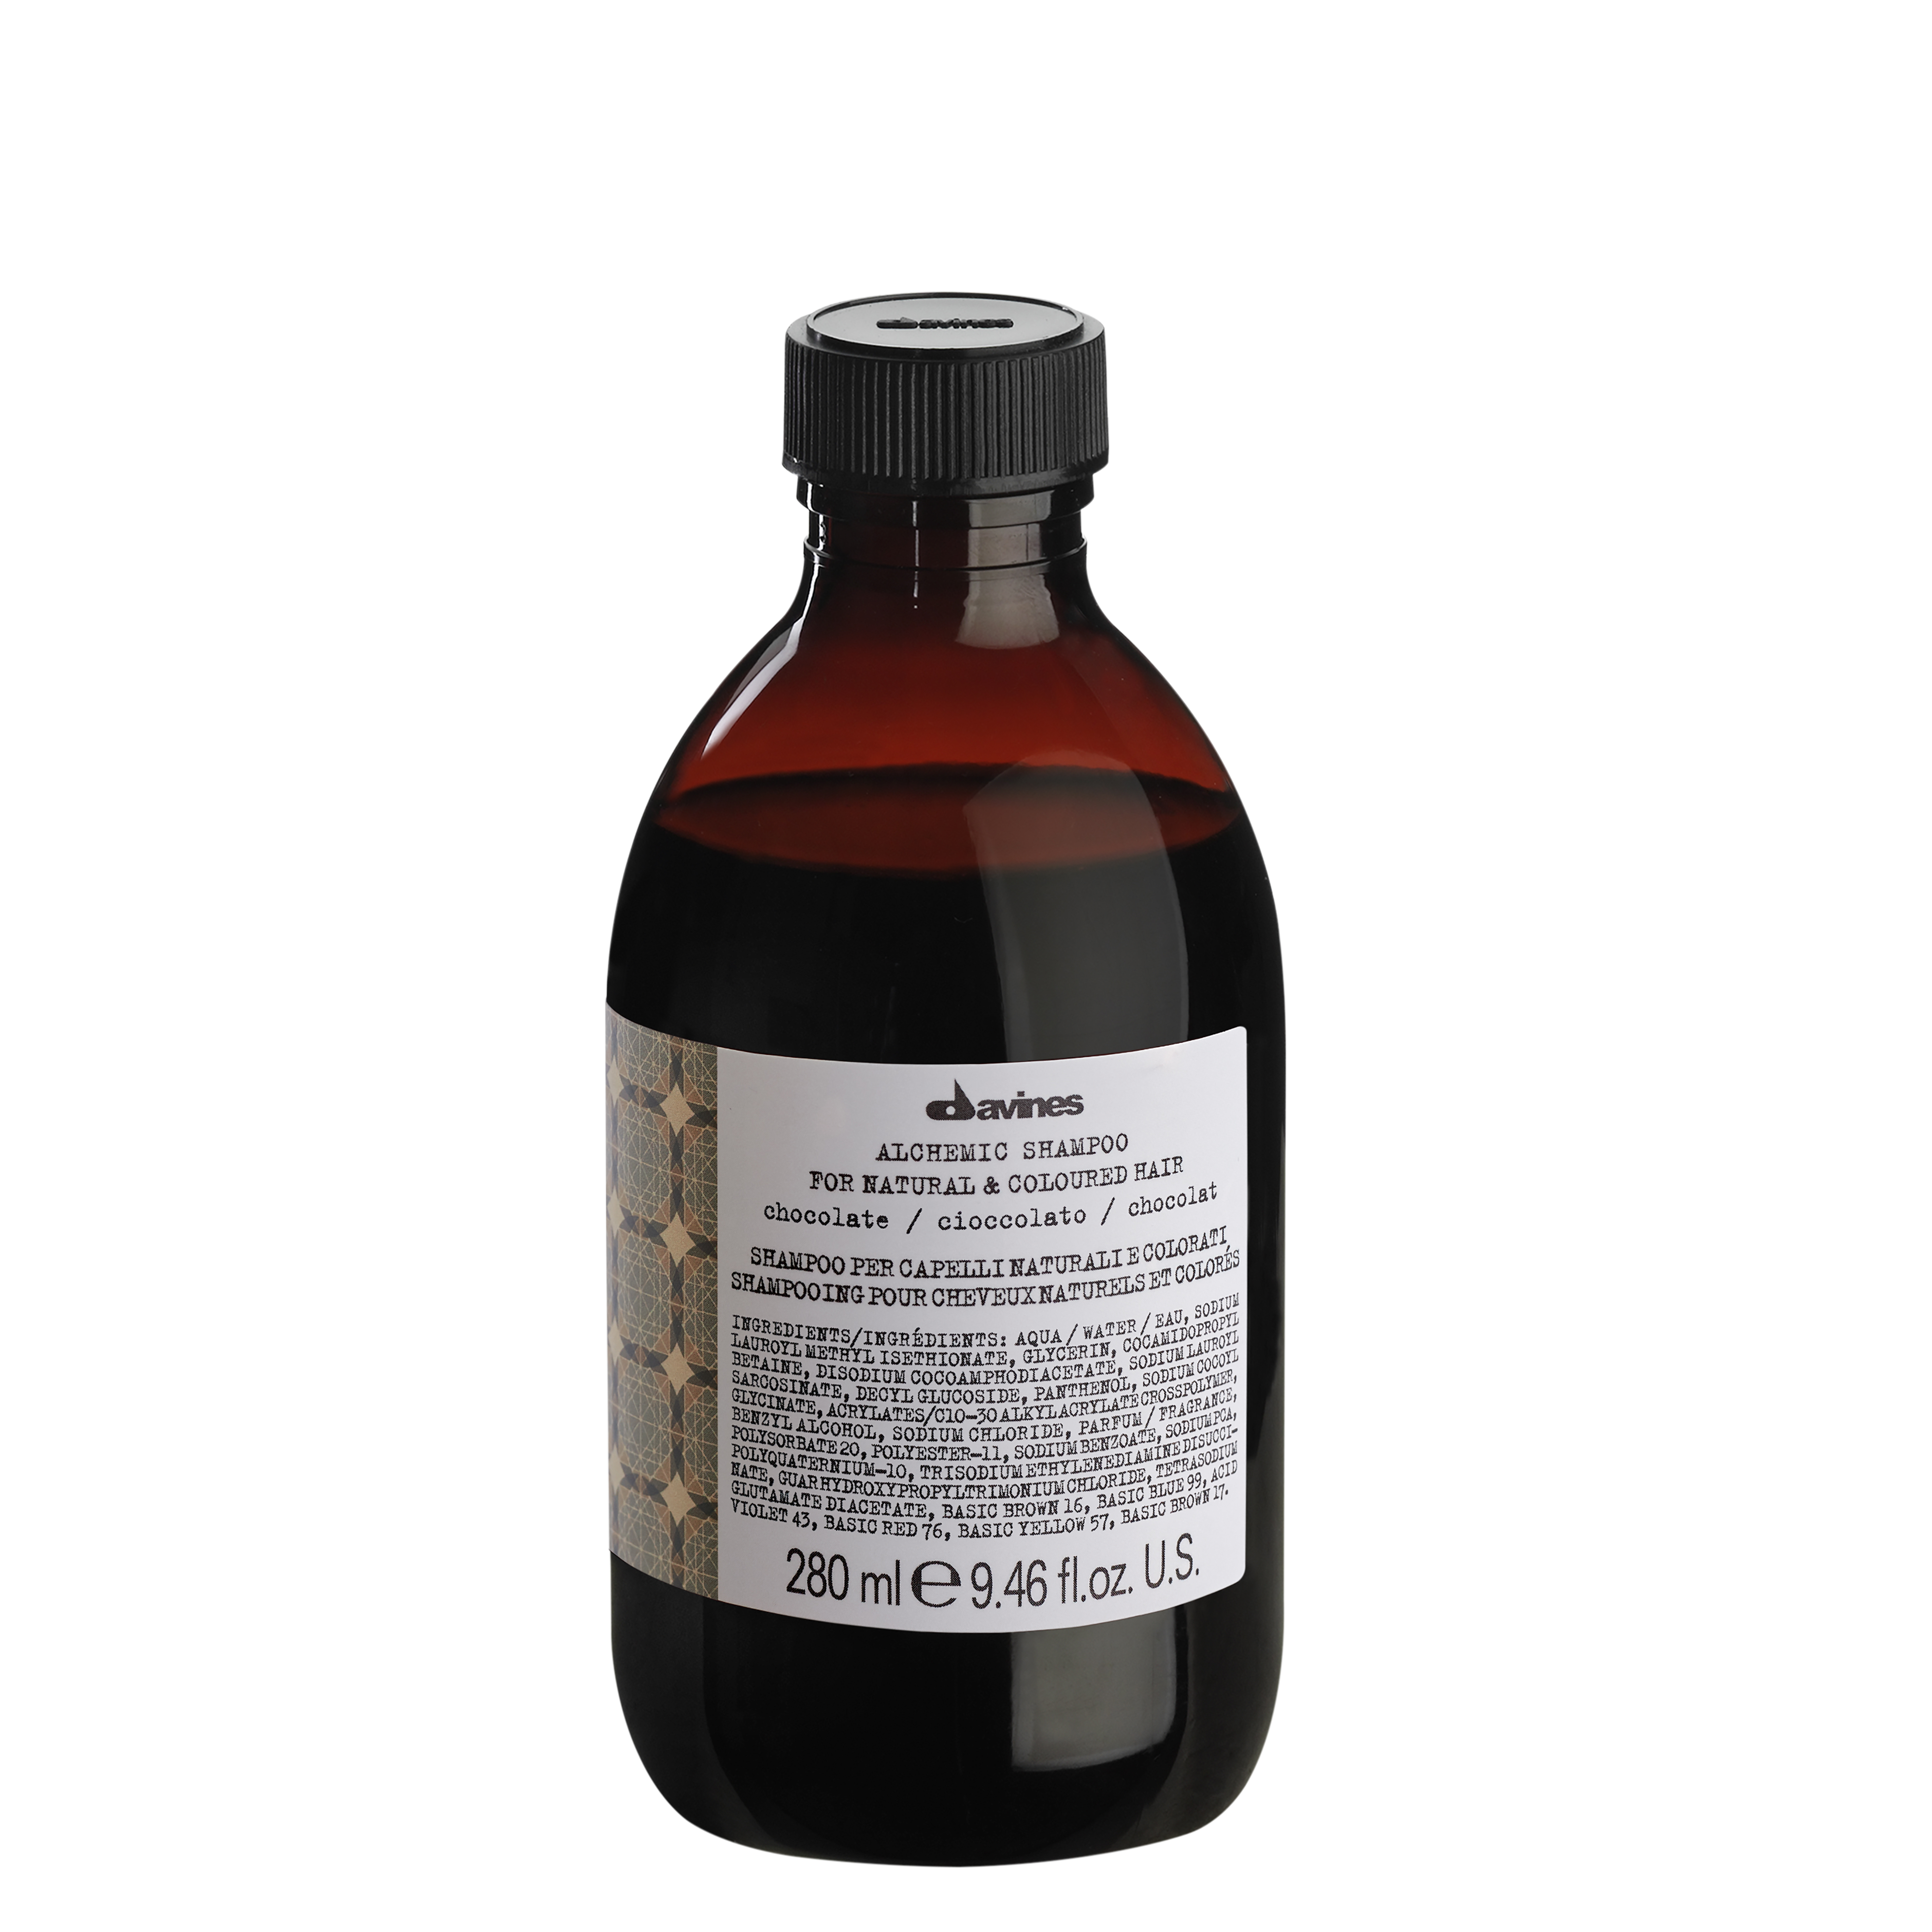 Alchemic Chocolate Shampoo 280ml